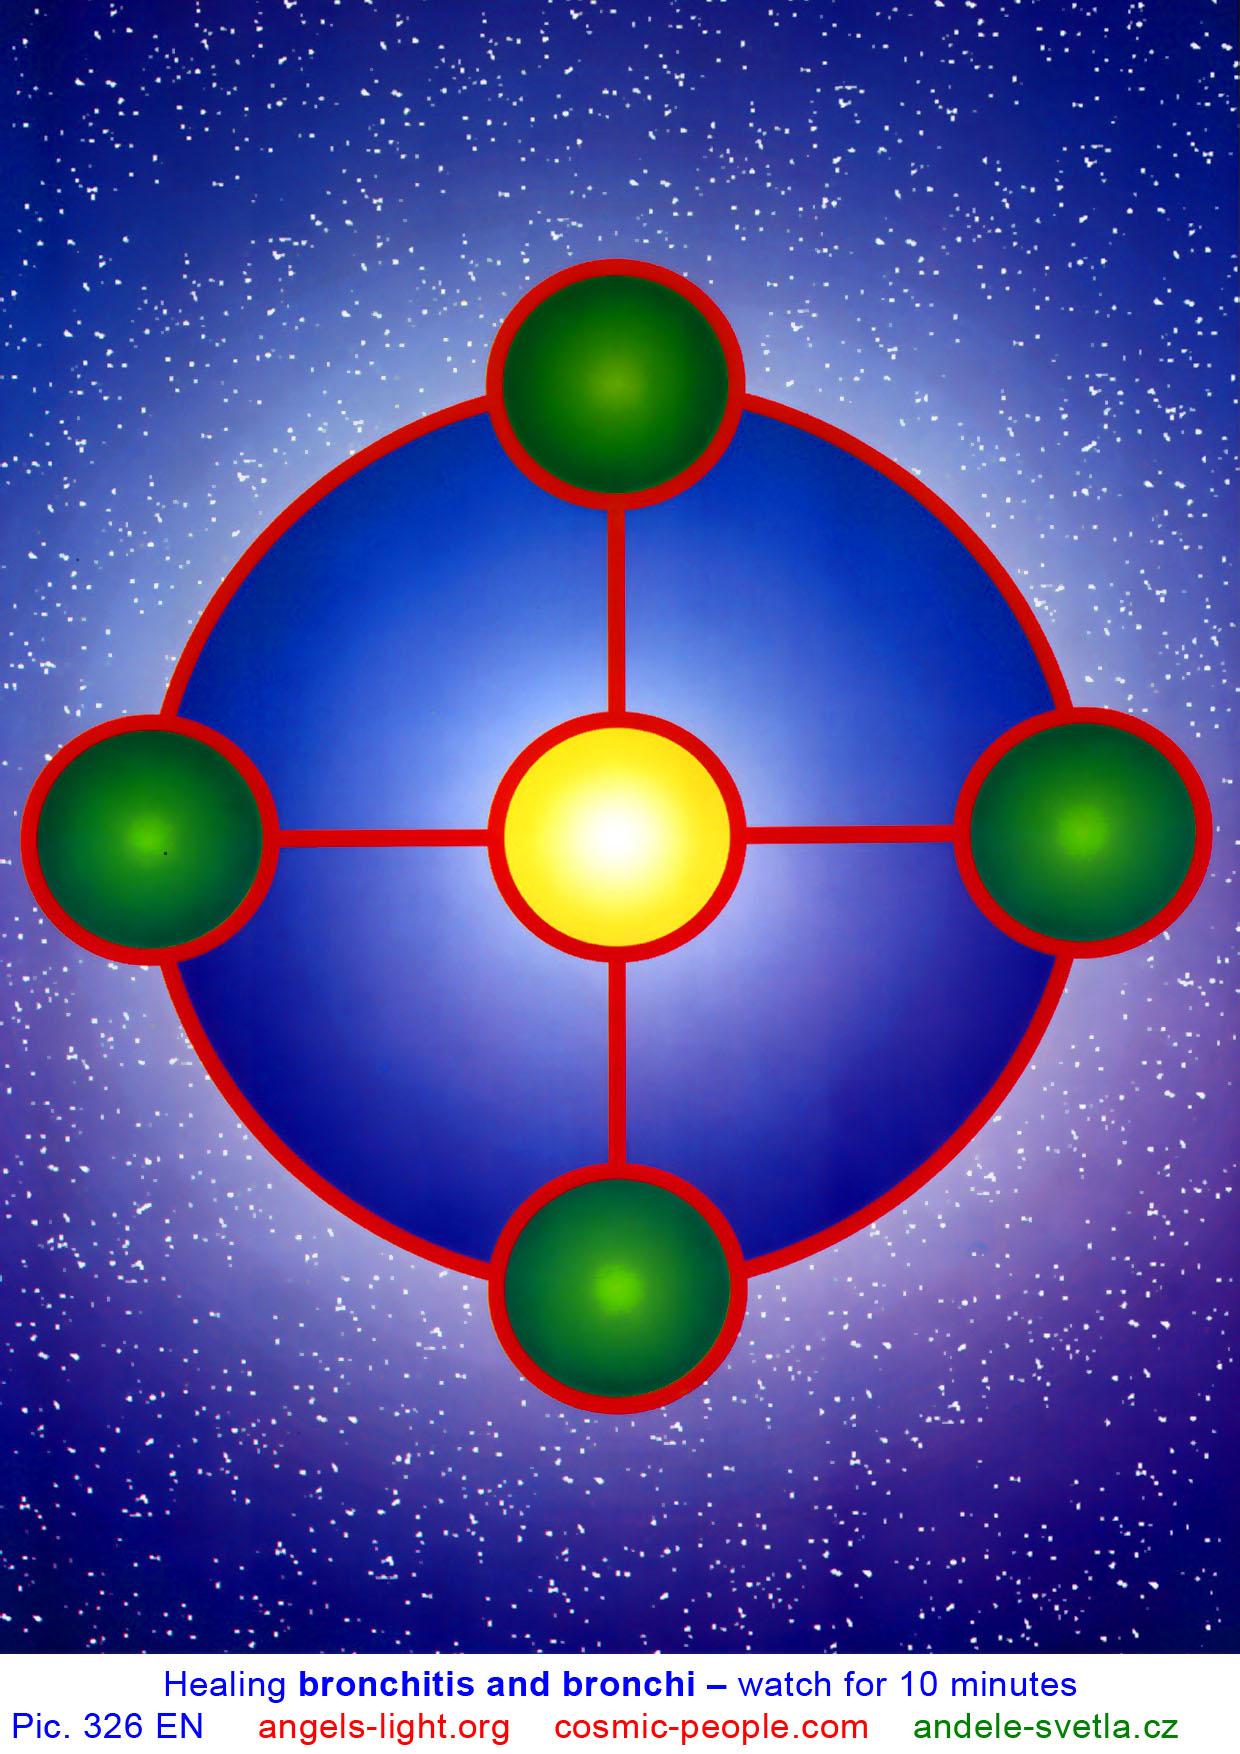 Spiritual figures and symbols - cosmic-people com